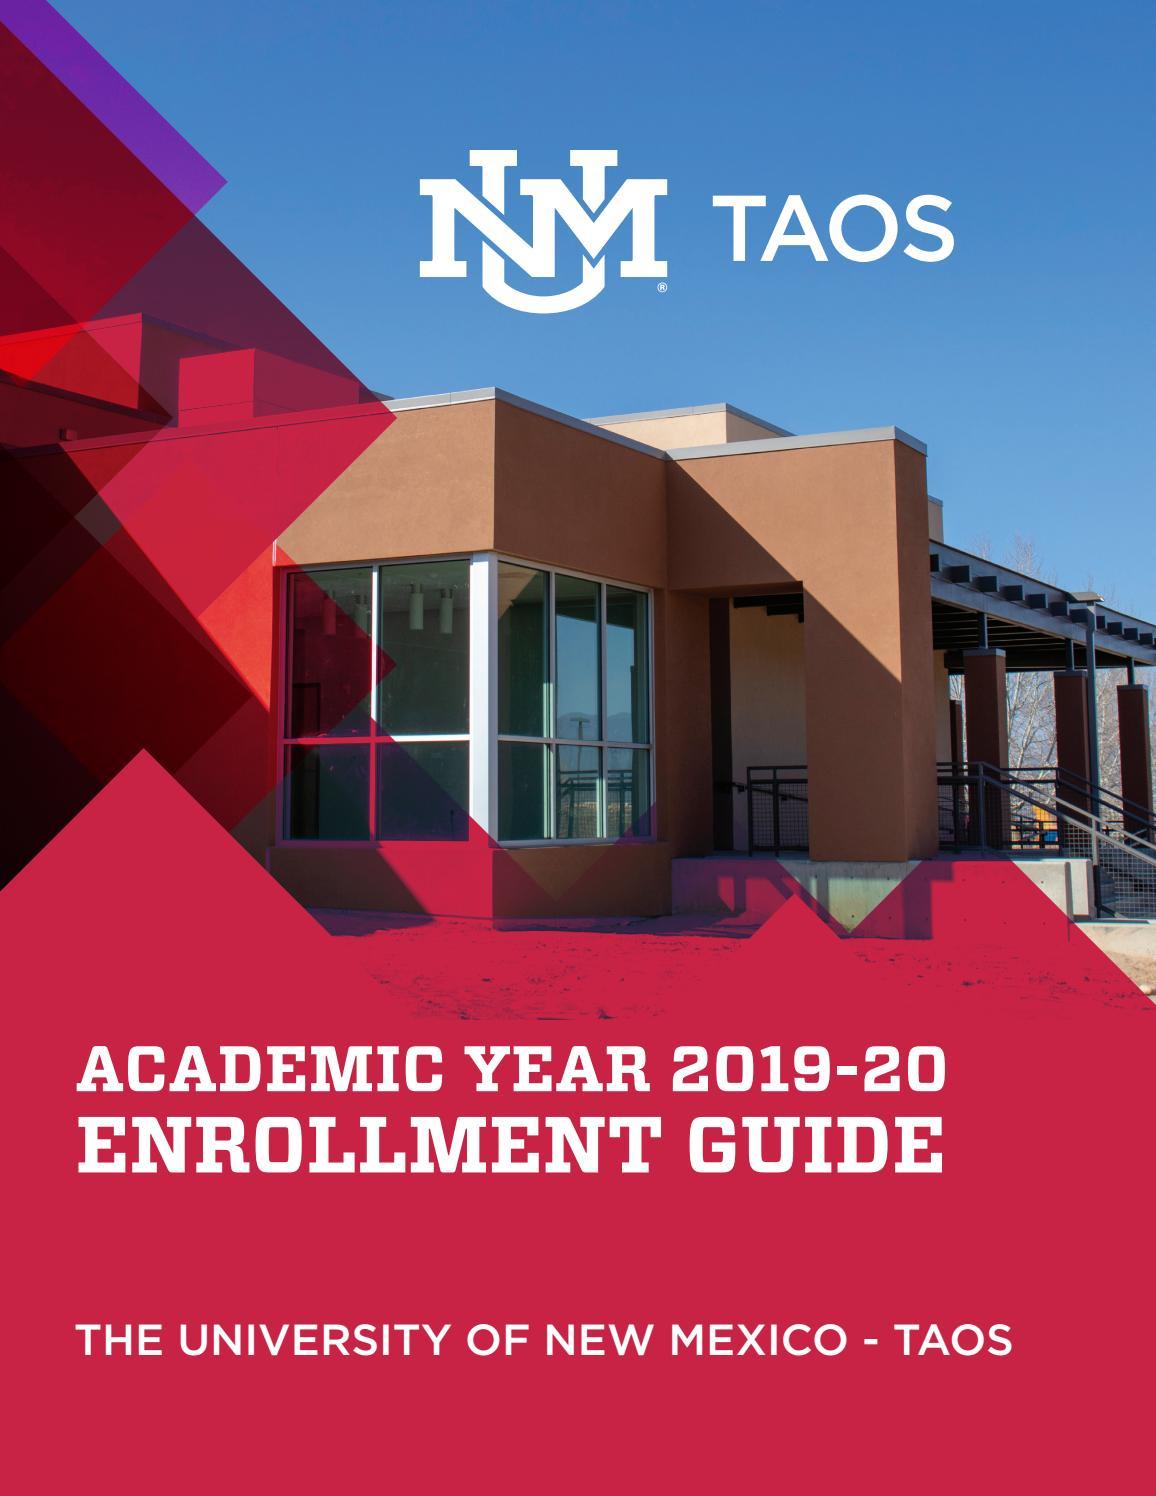 Unm Academic Calendar Fall 2020.Unm Taos Enrollment Guide Academic Year 2019 20 By Unm Taos